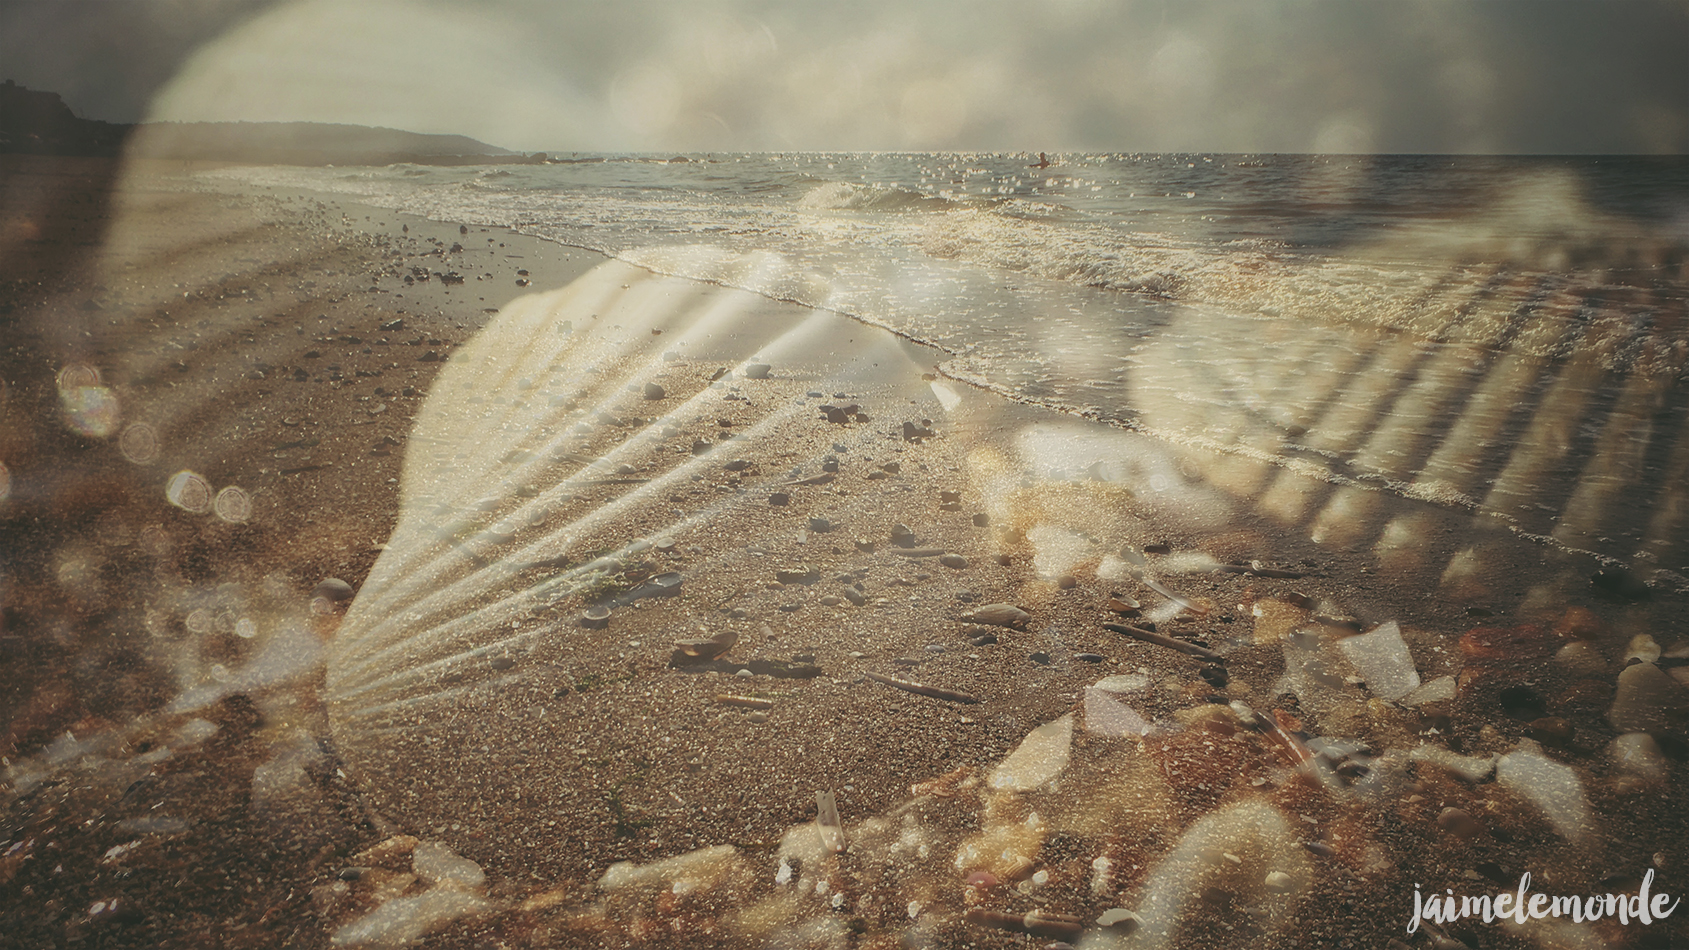 Pixter - Double exposition Snapseed - Blonville sur mer - ©jaimelemonde (1)